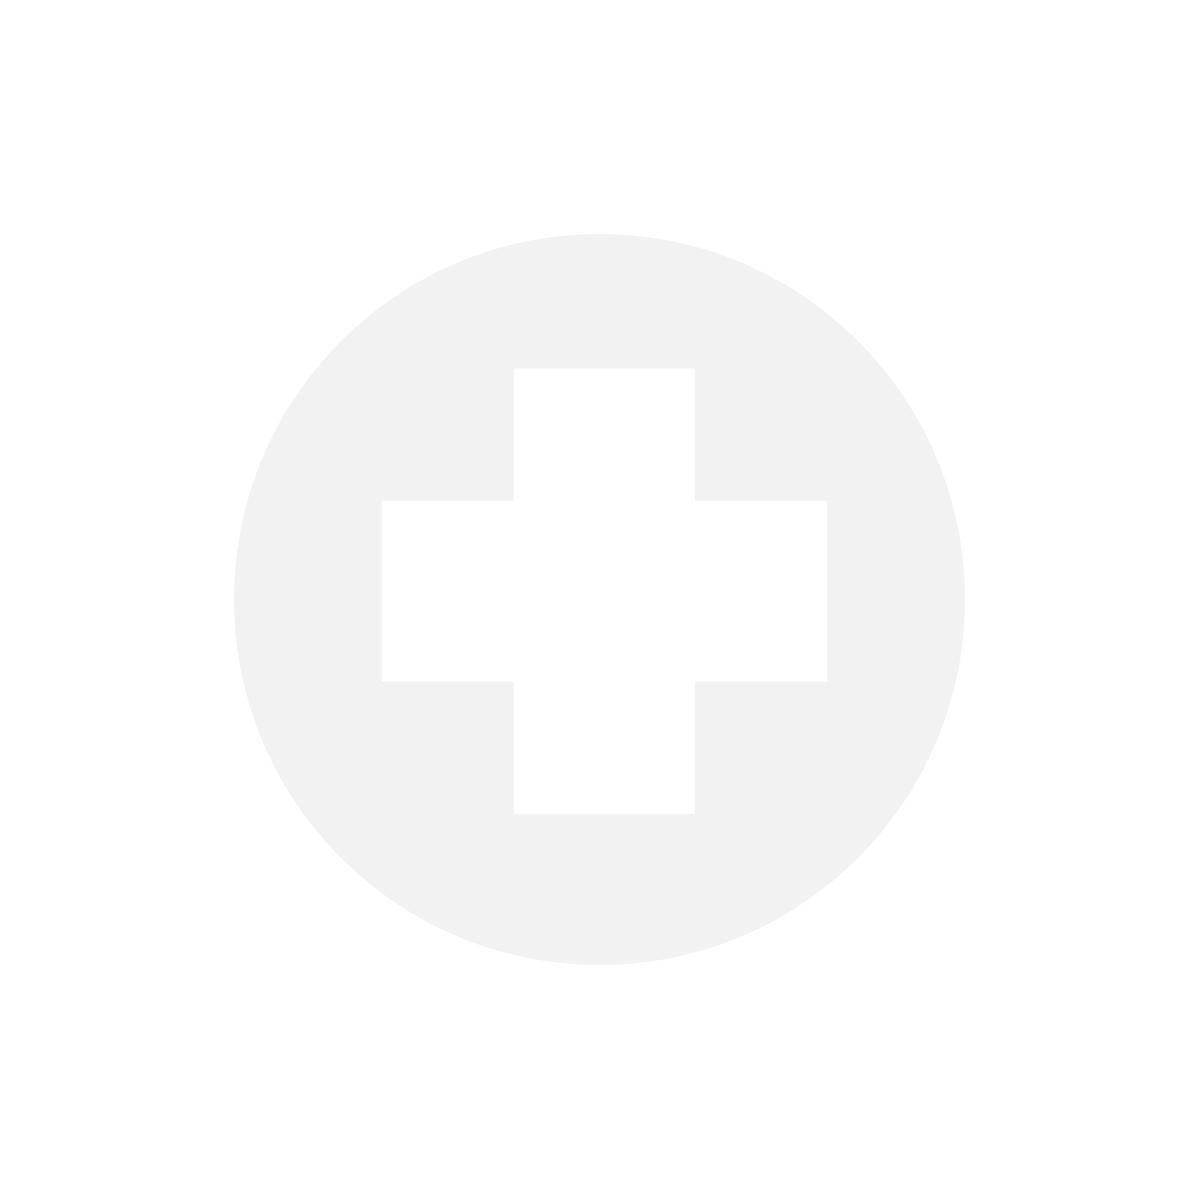 Bas Veinax - Microtrans